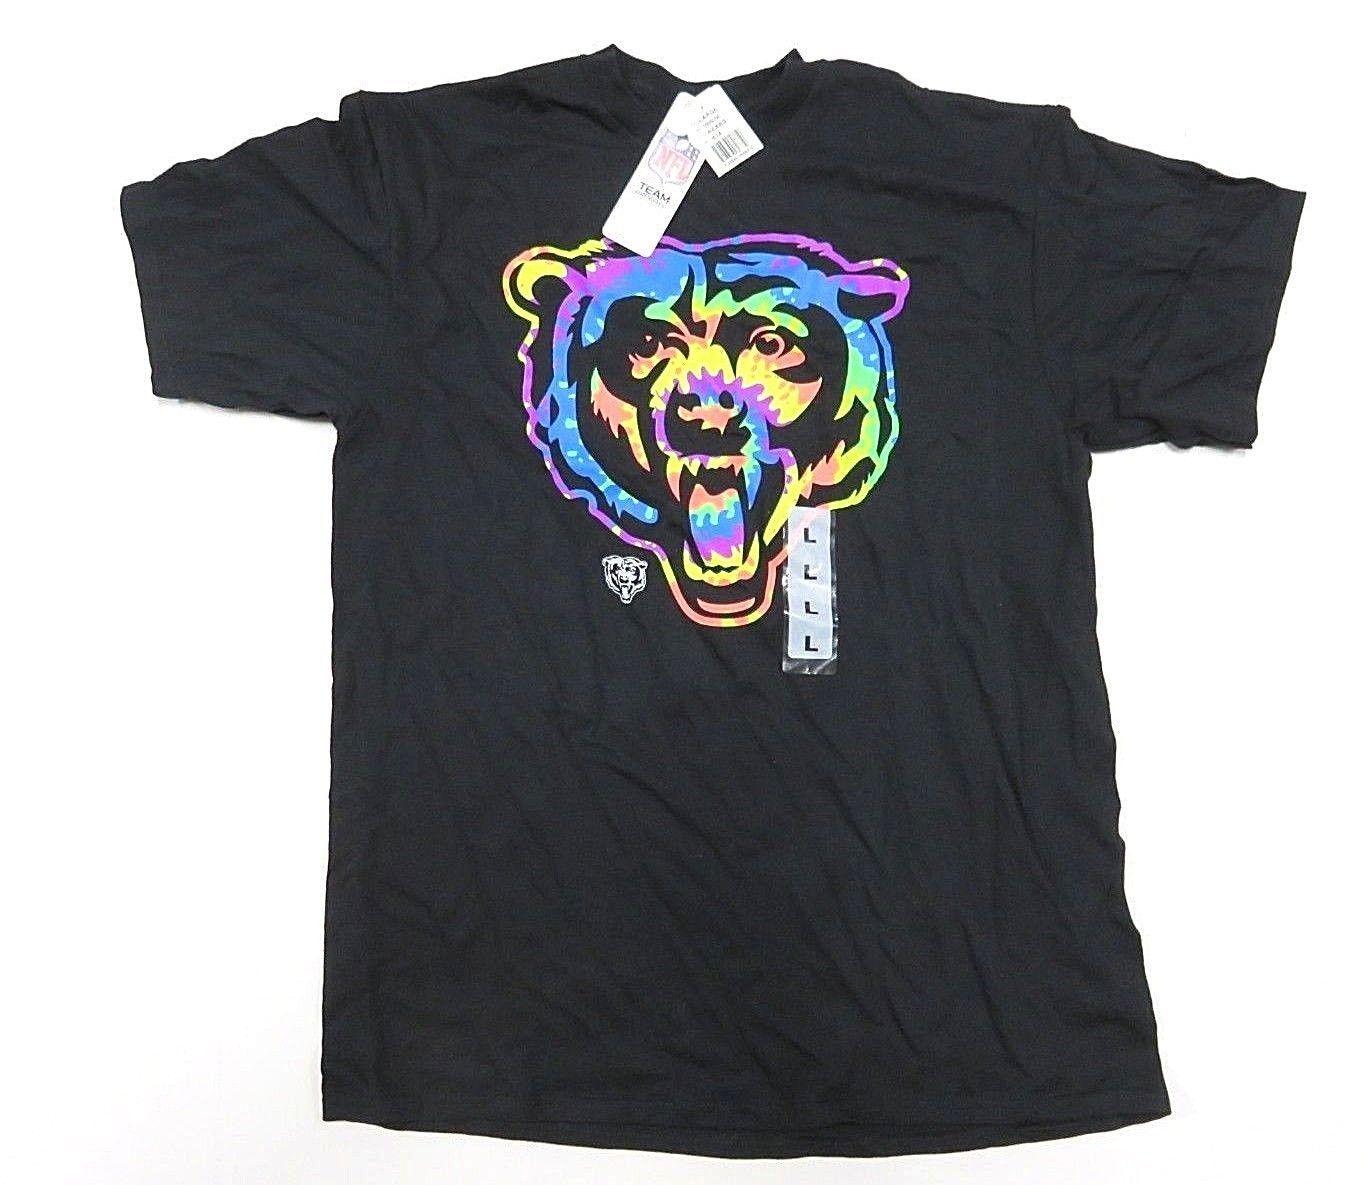 NWT NFL Team Apparel Chicago Bears Black w/ Rainbow Graphic T-Shirt Men's Size L